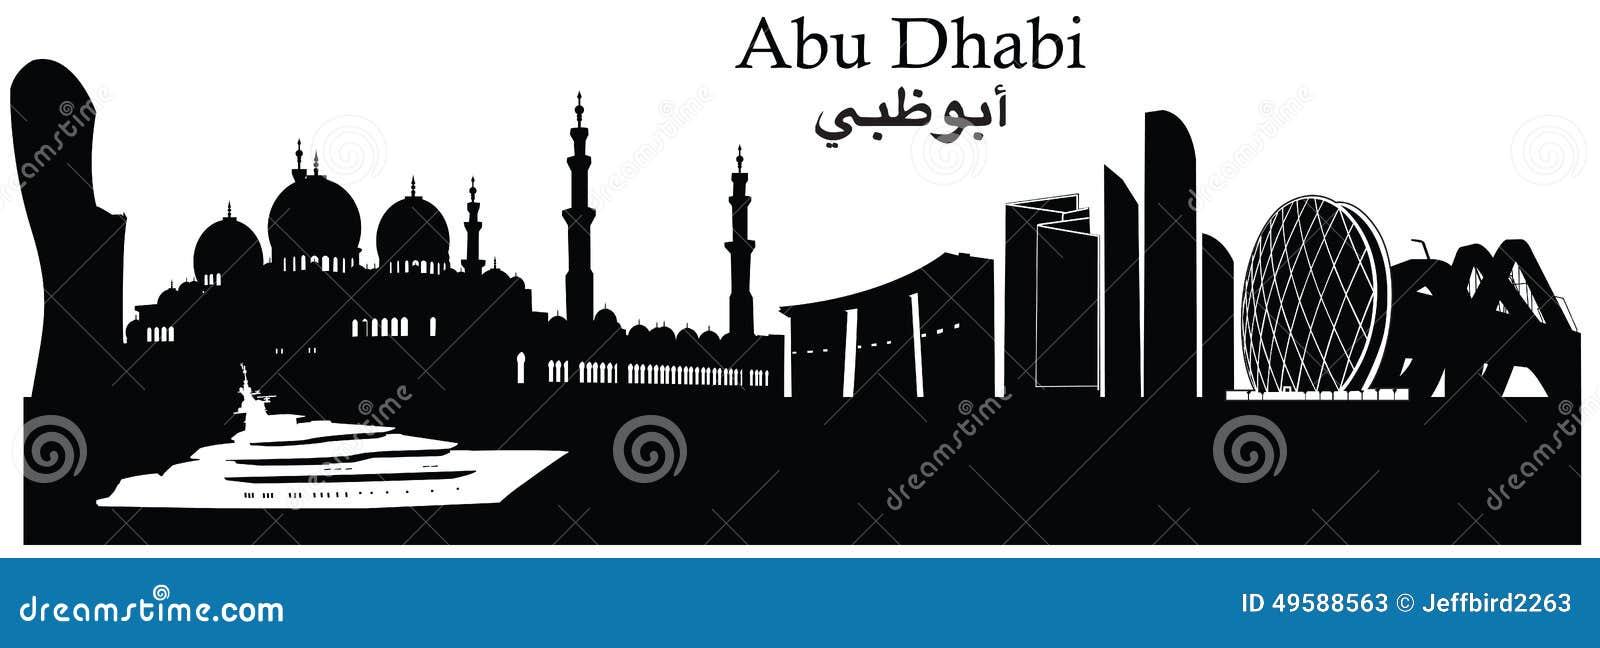 Abu Dhabi Cityscape Sk...